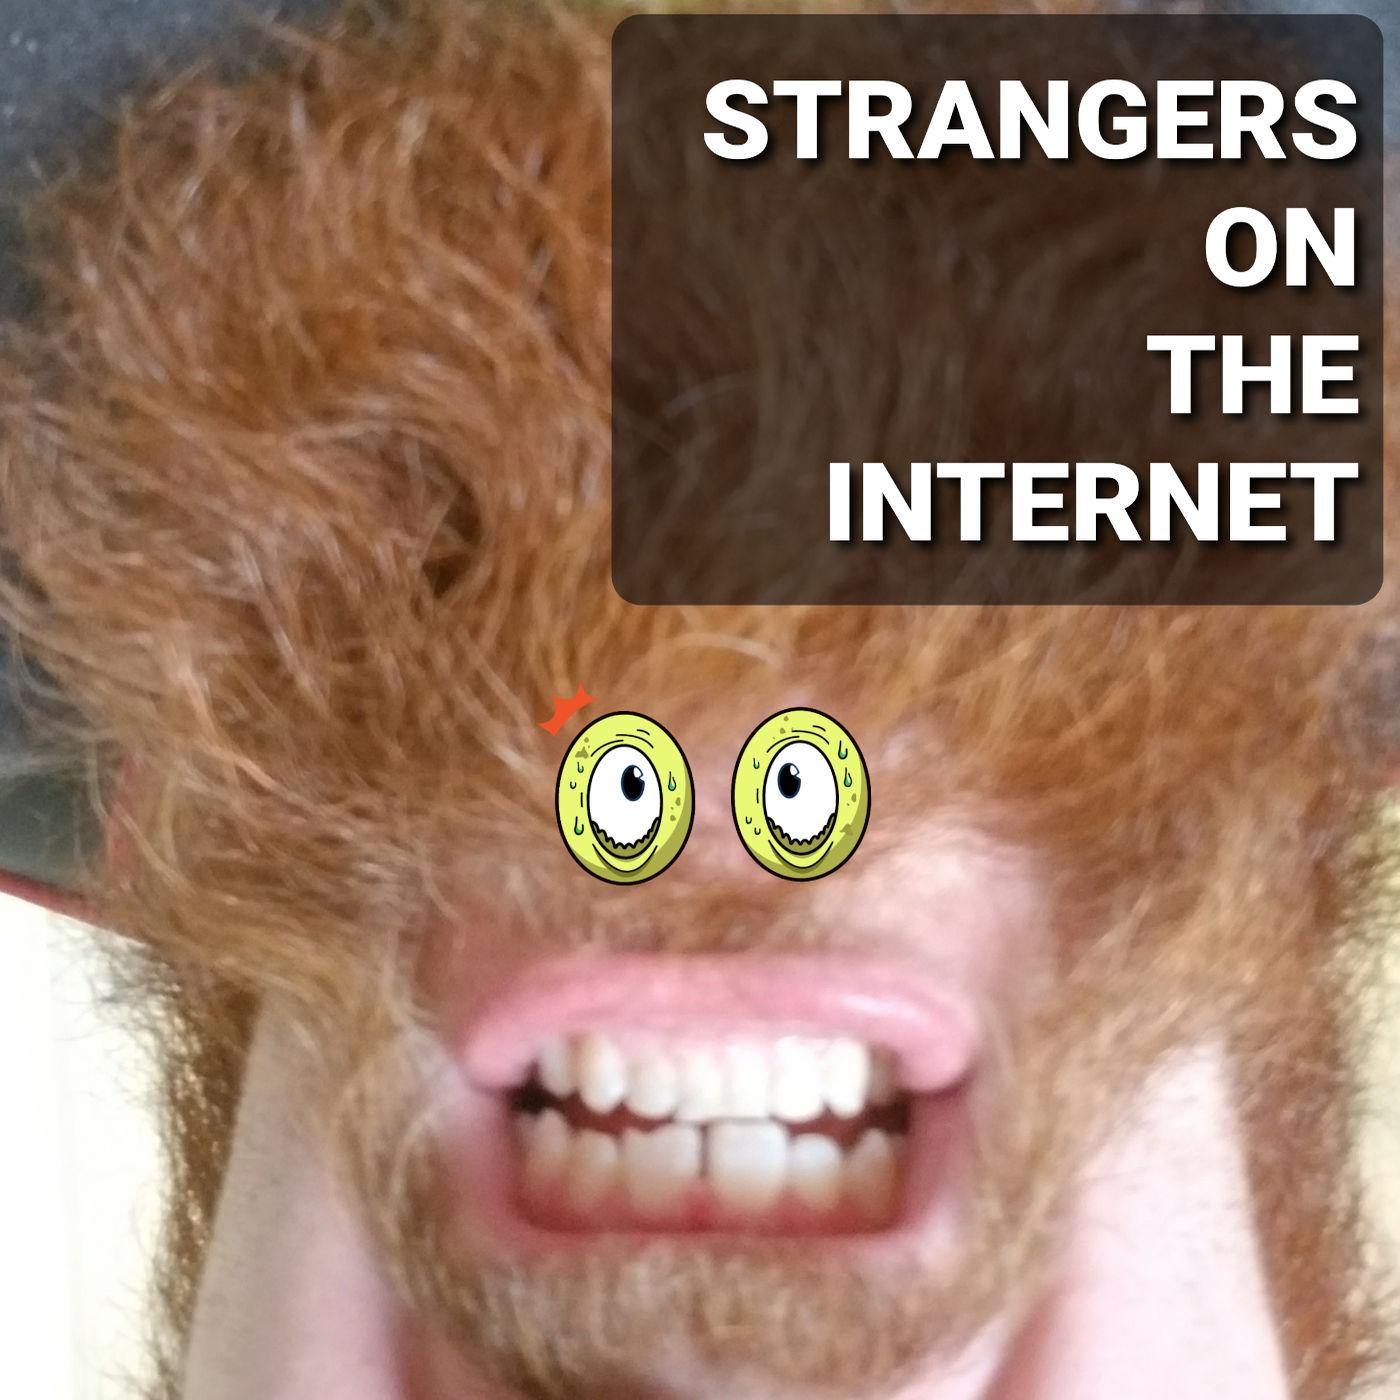 Strangers on the Internet